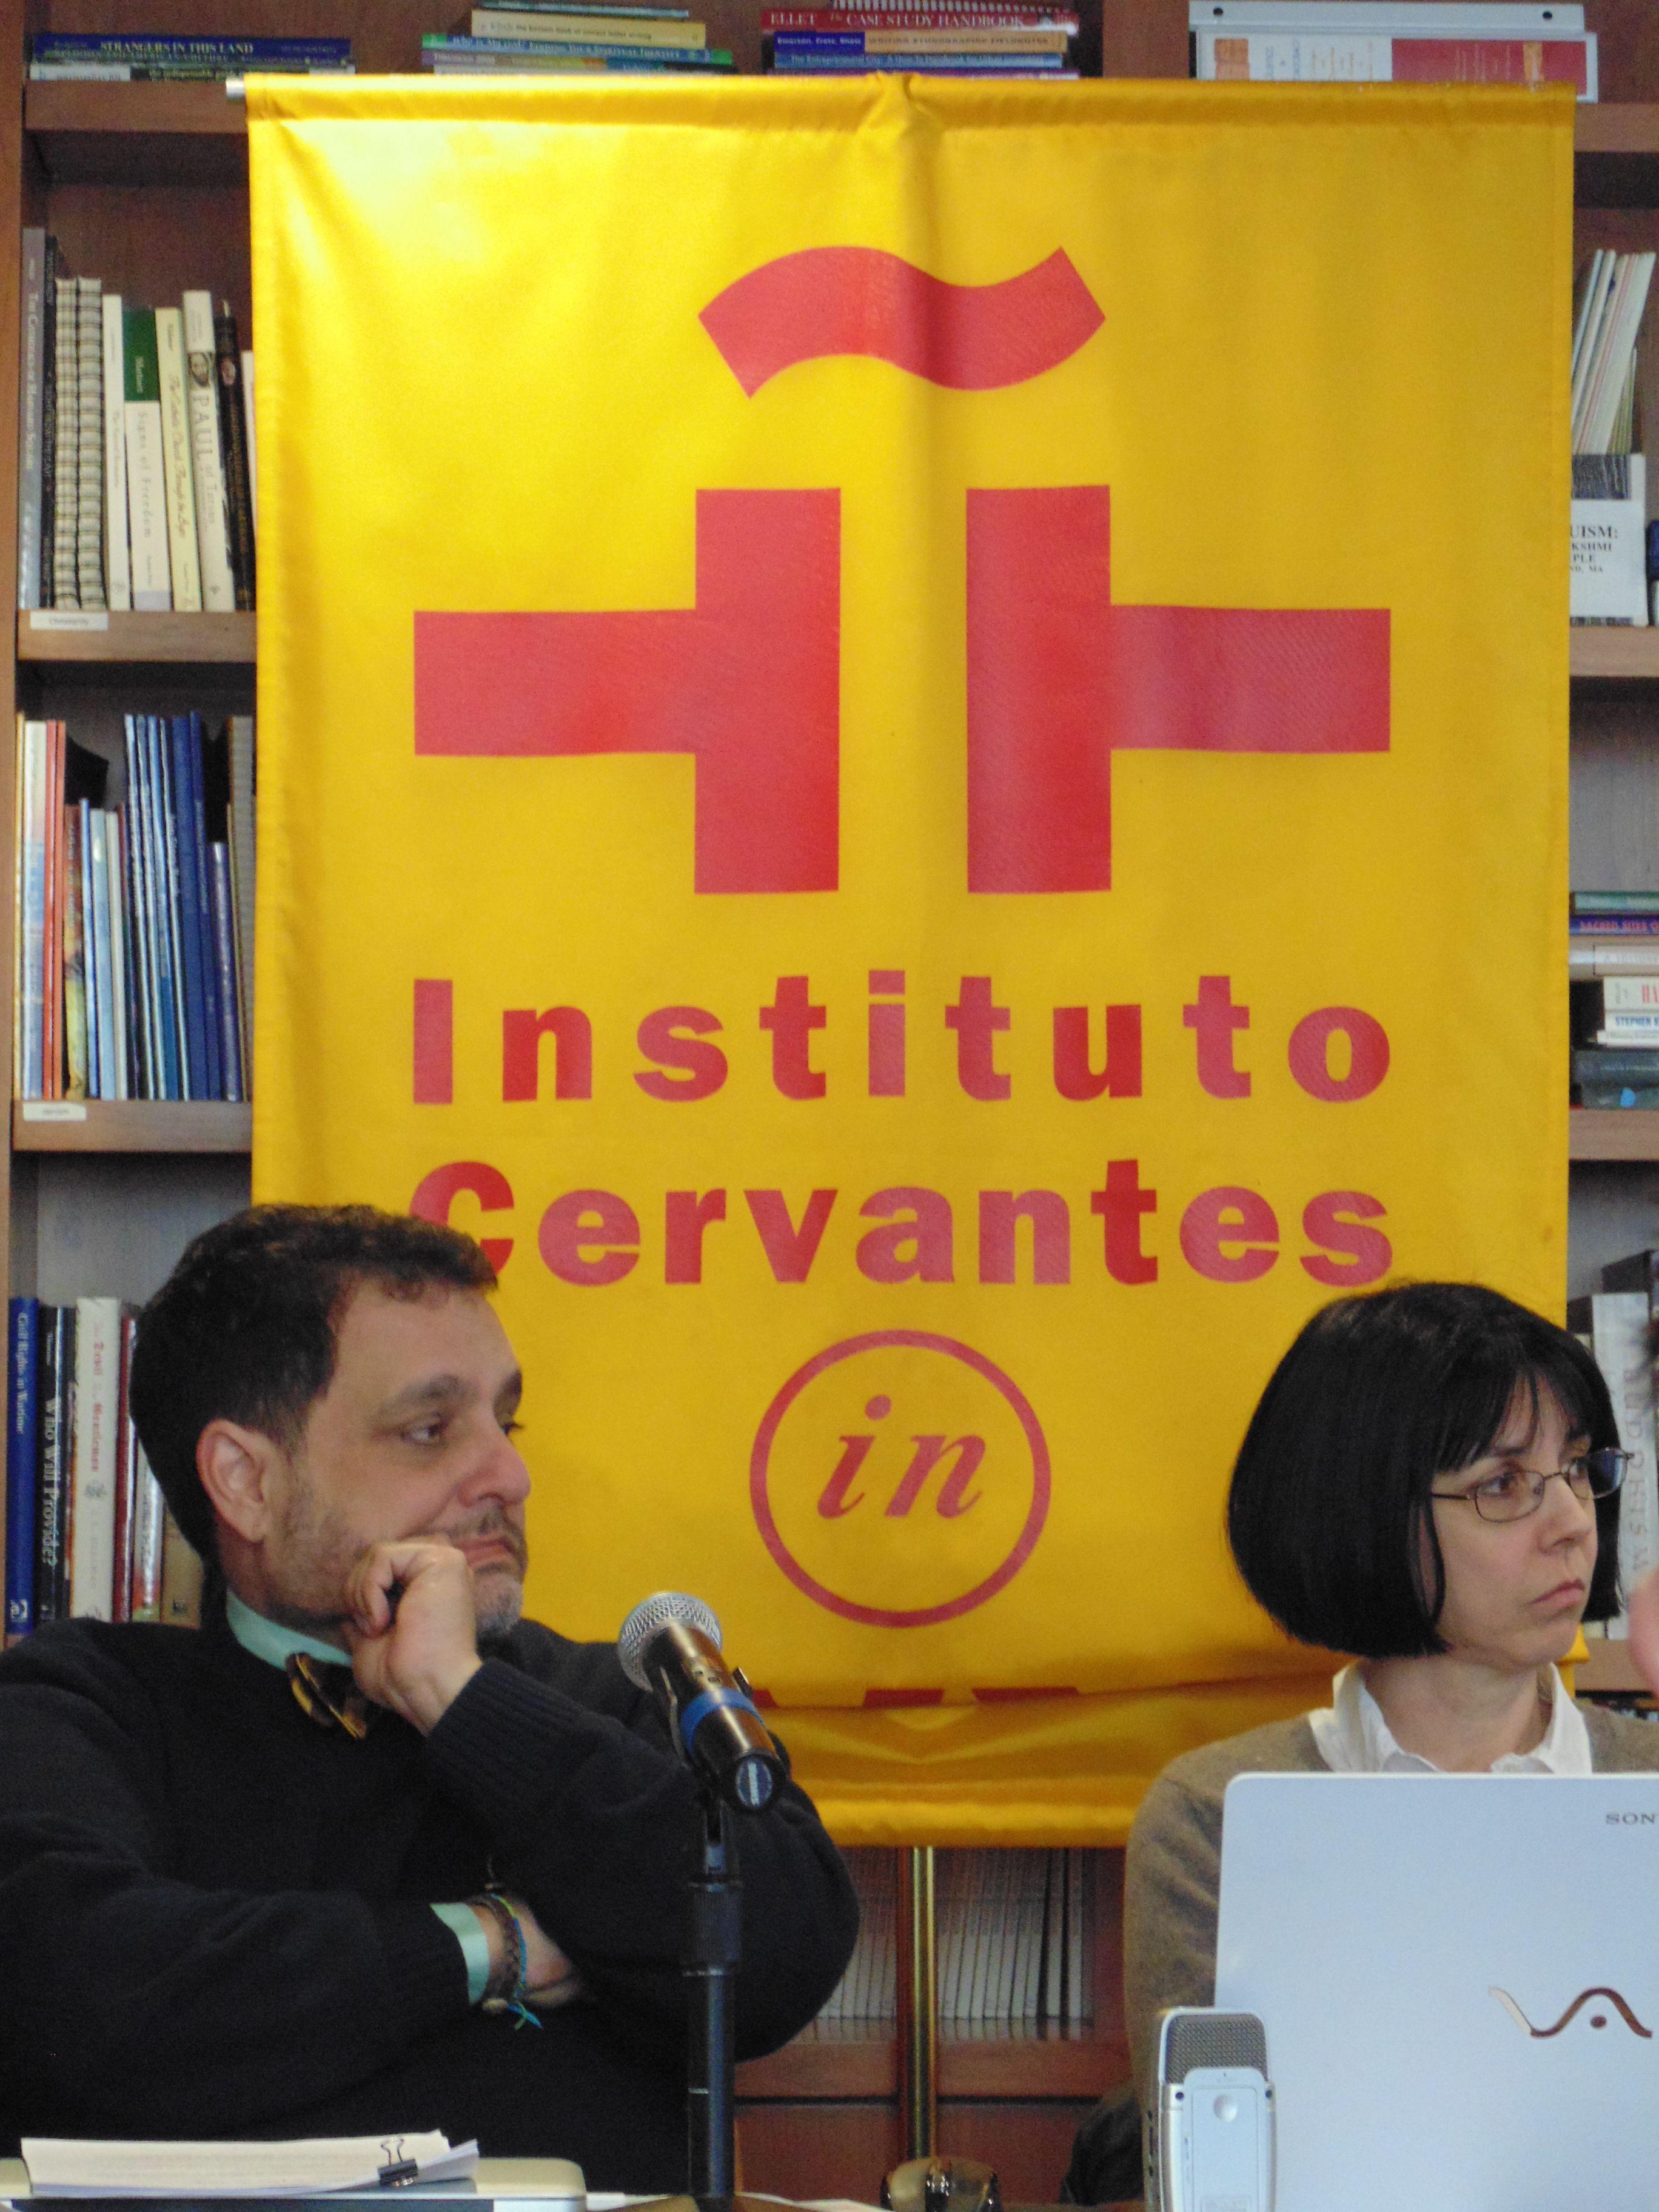 Pedro Reina Pérez y Silvia Lazo